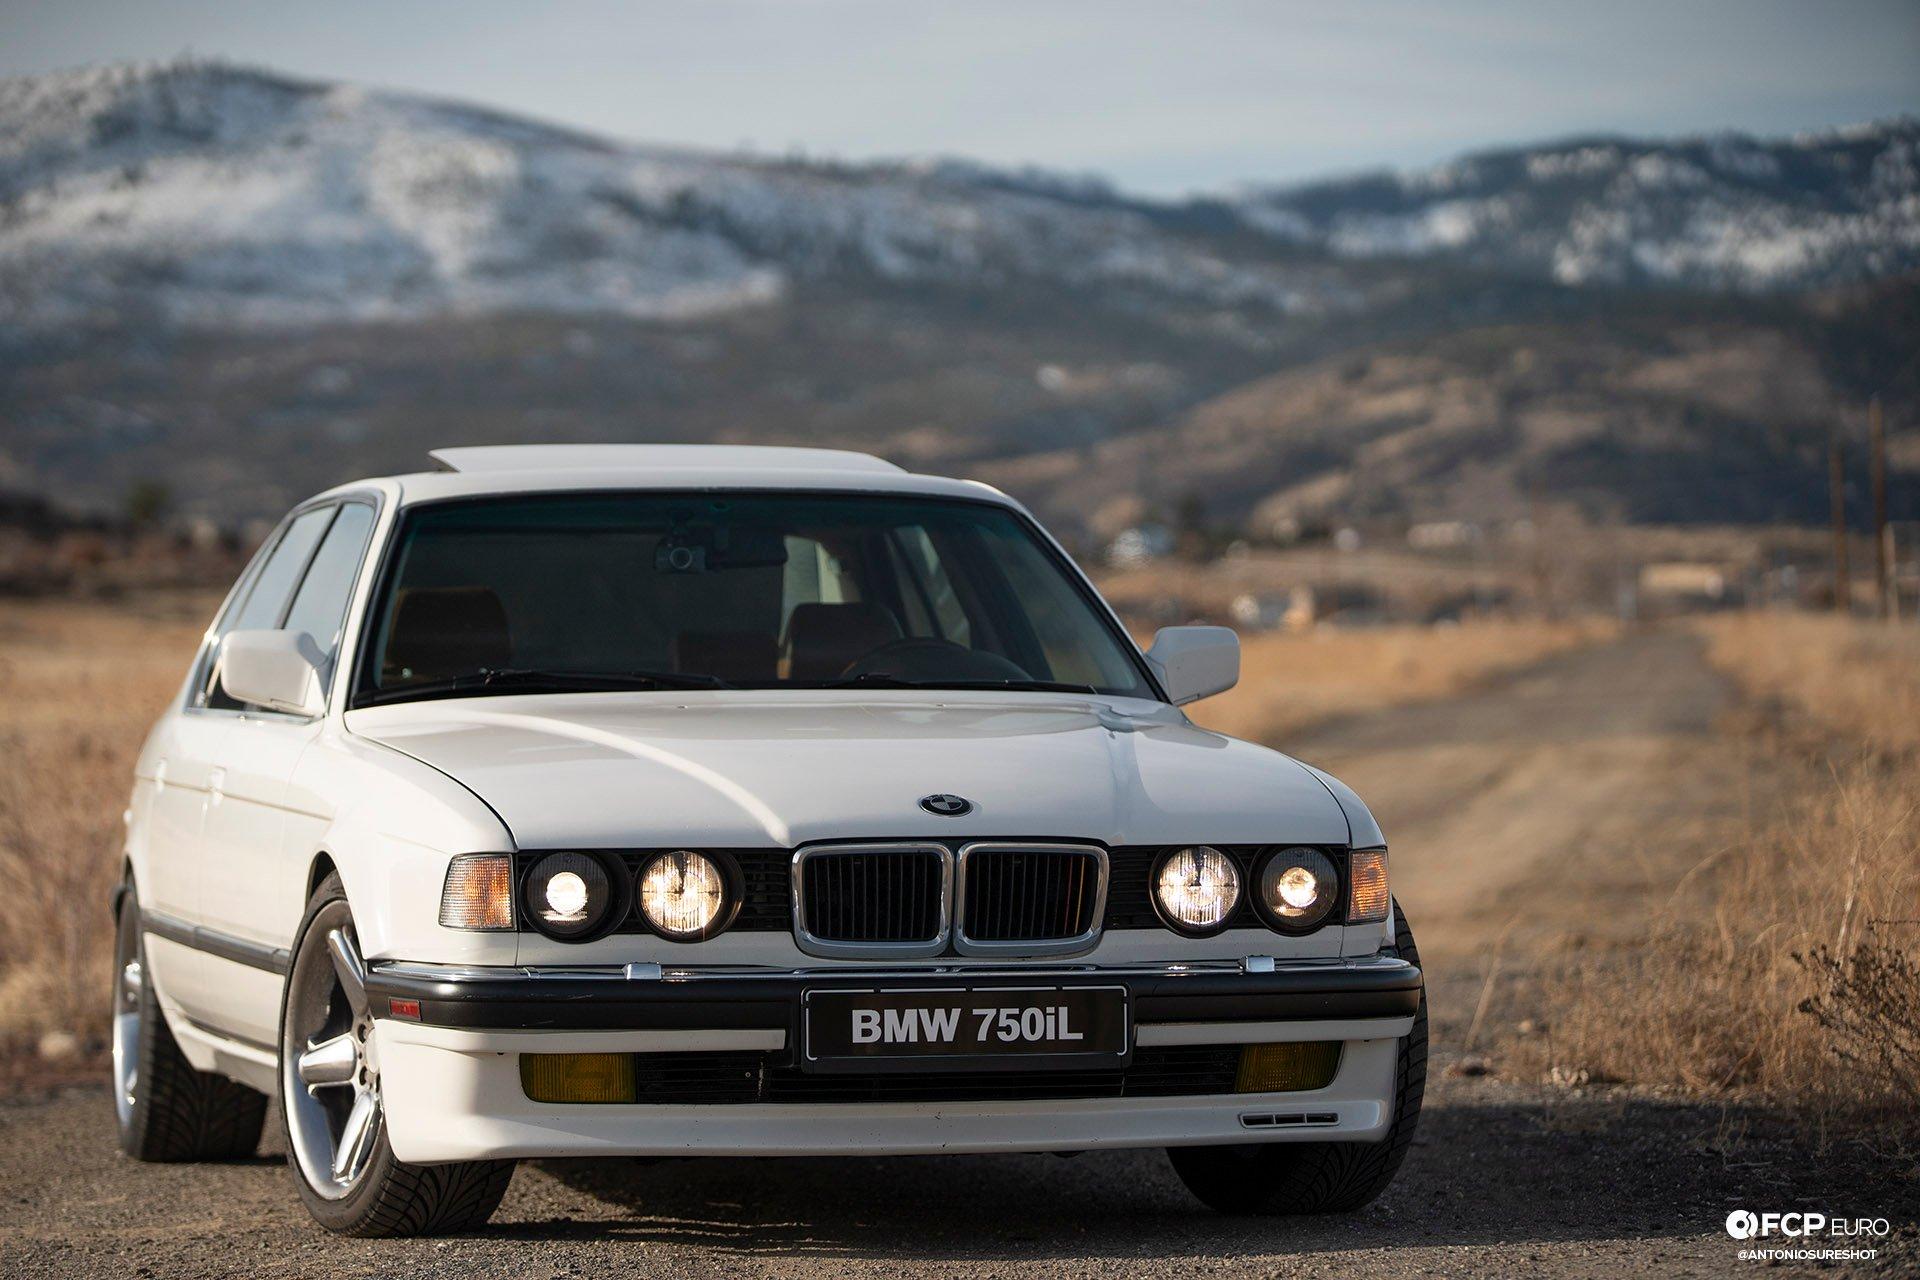 BMW E32 750iL 6 speed A9A02510